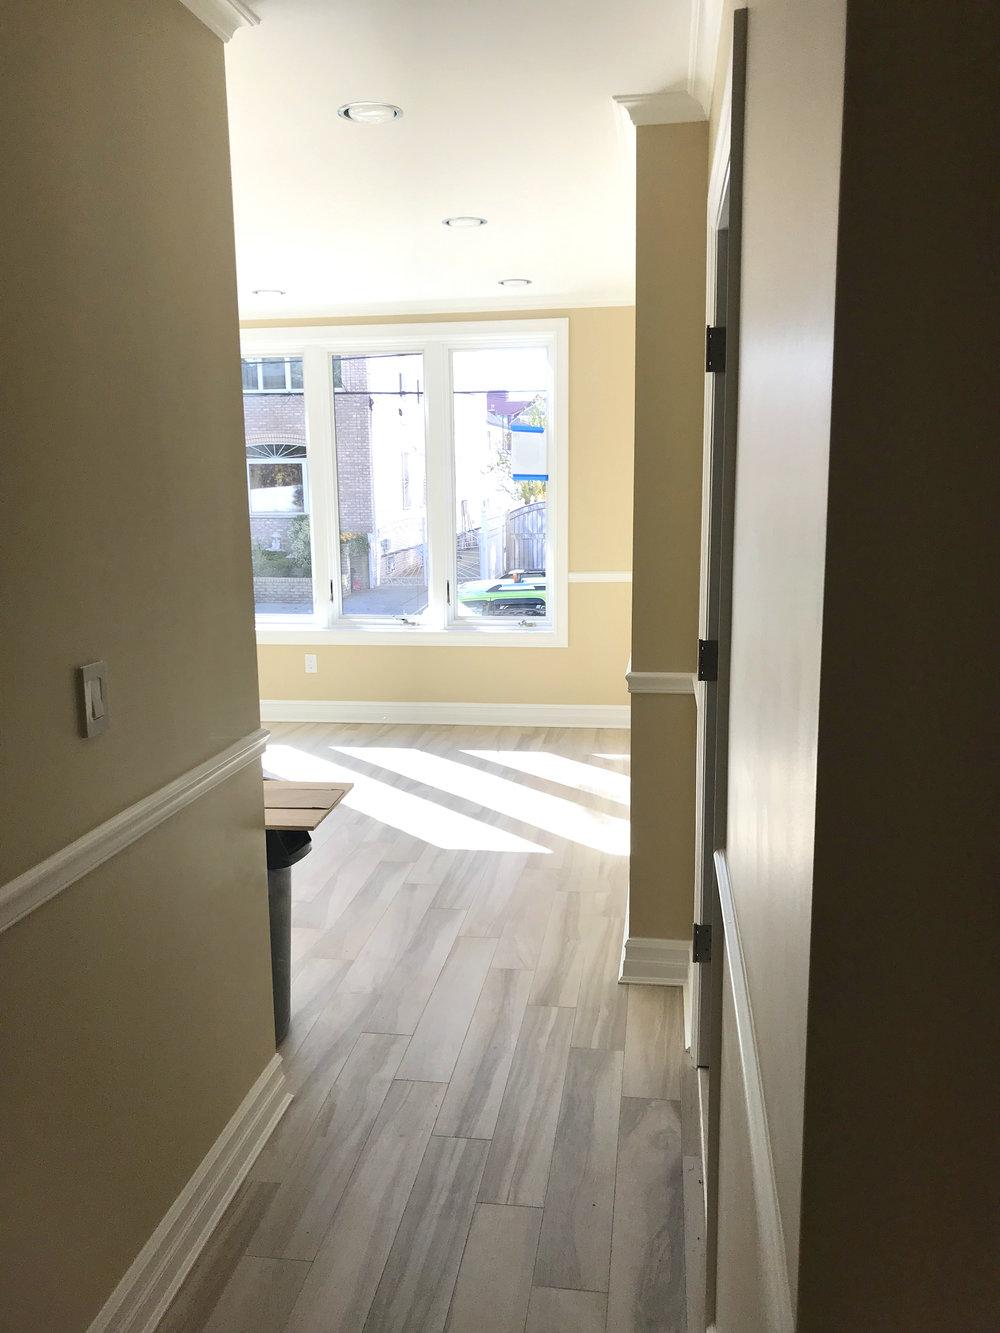 woodgrain-hallway-1.jpg